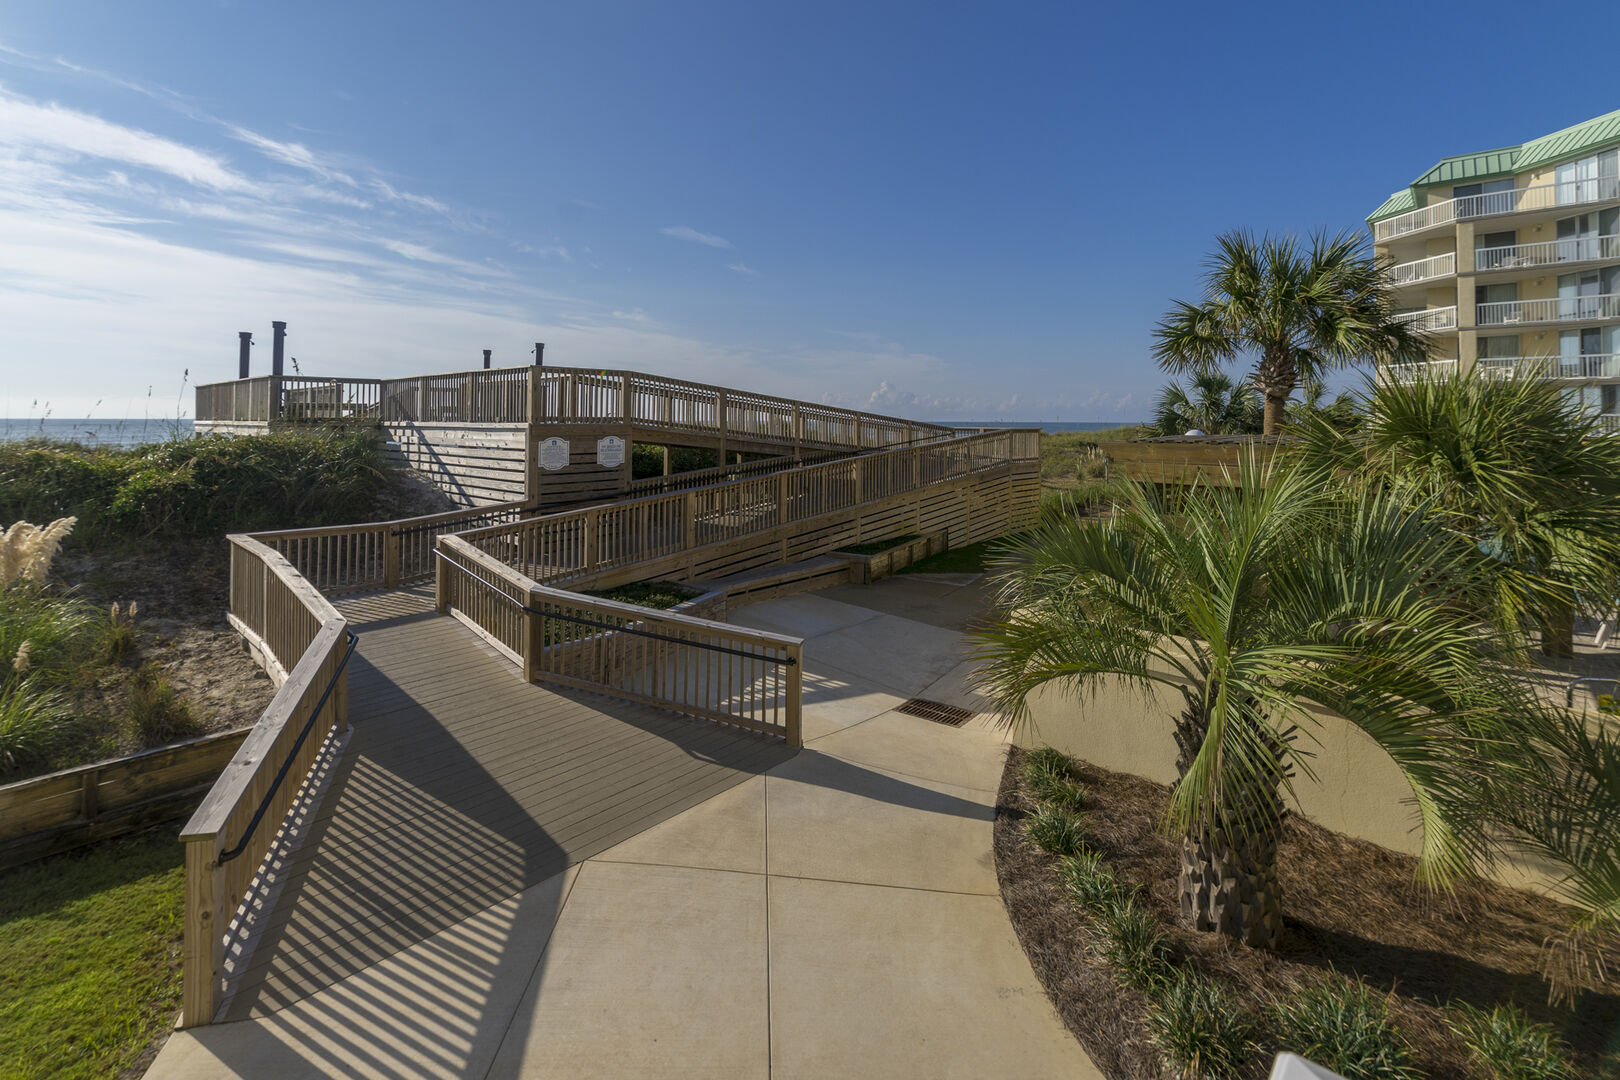 Handicap Accessible Beach Ramp